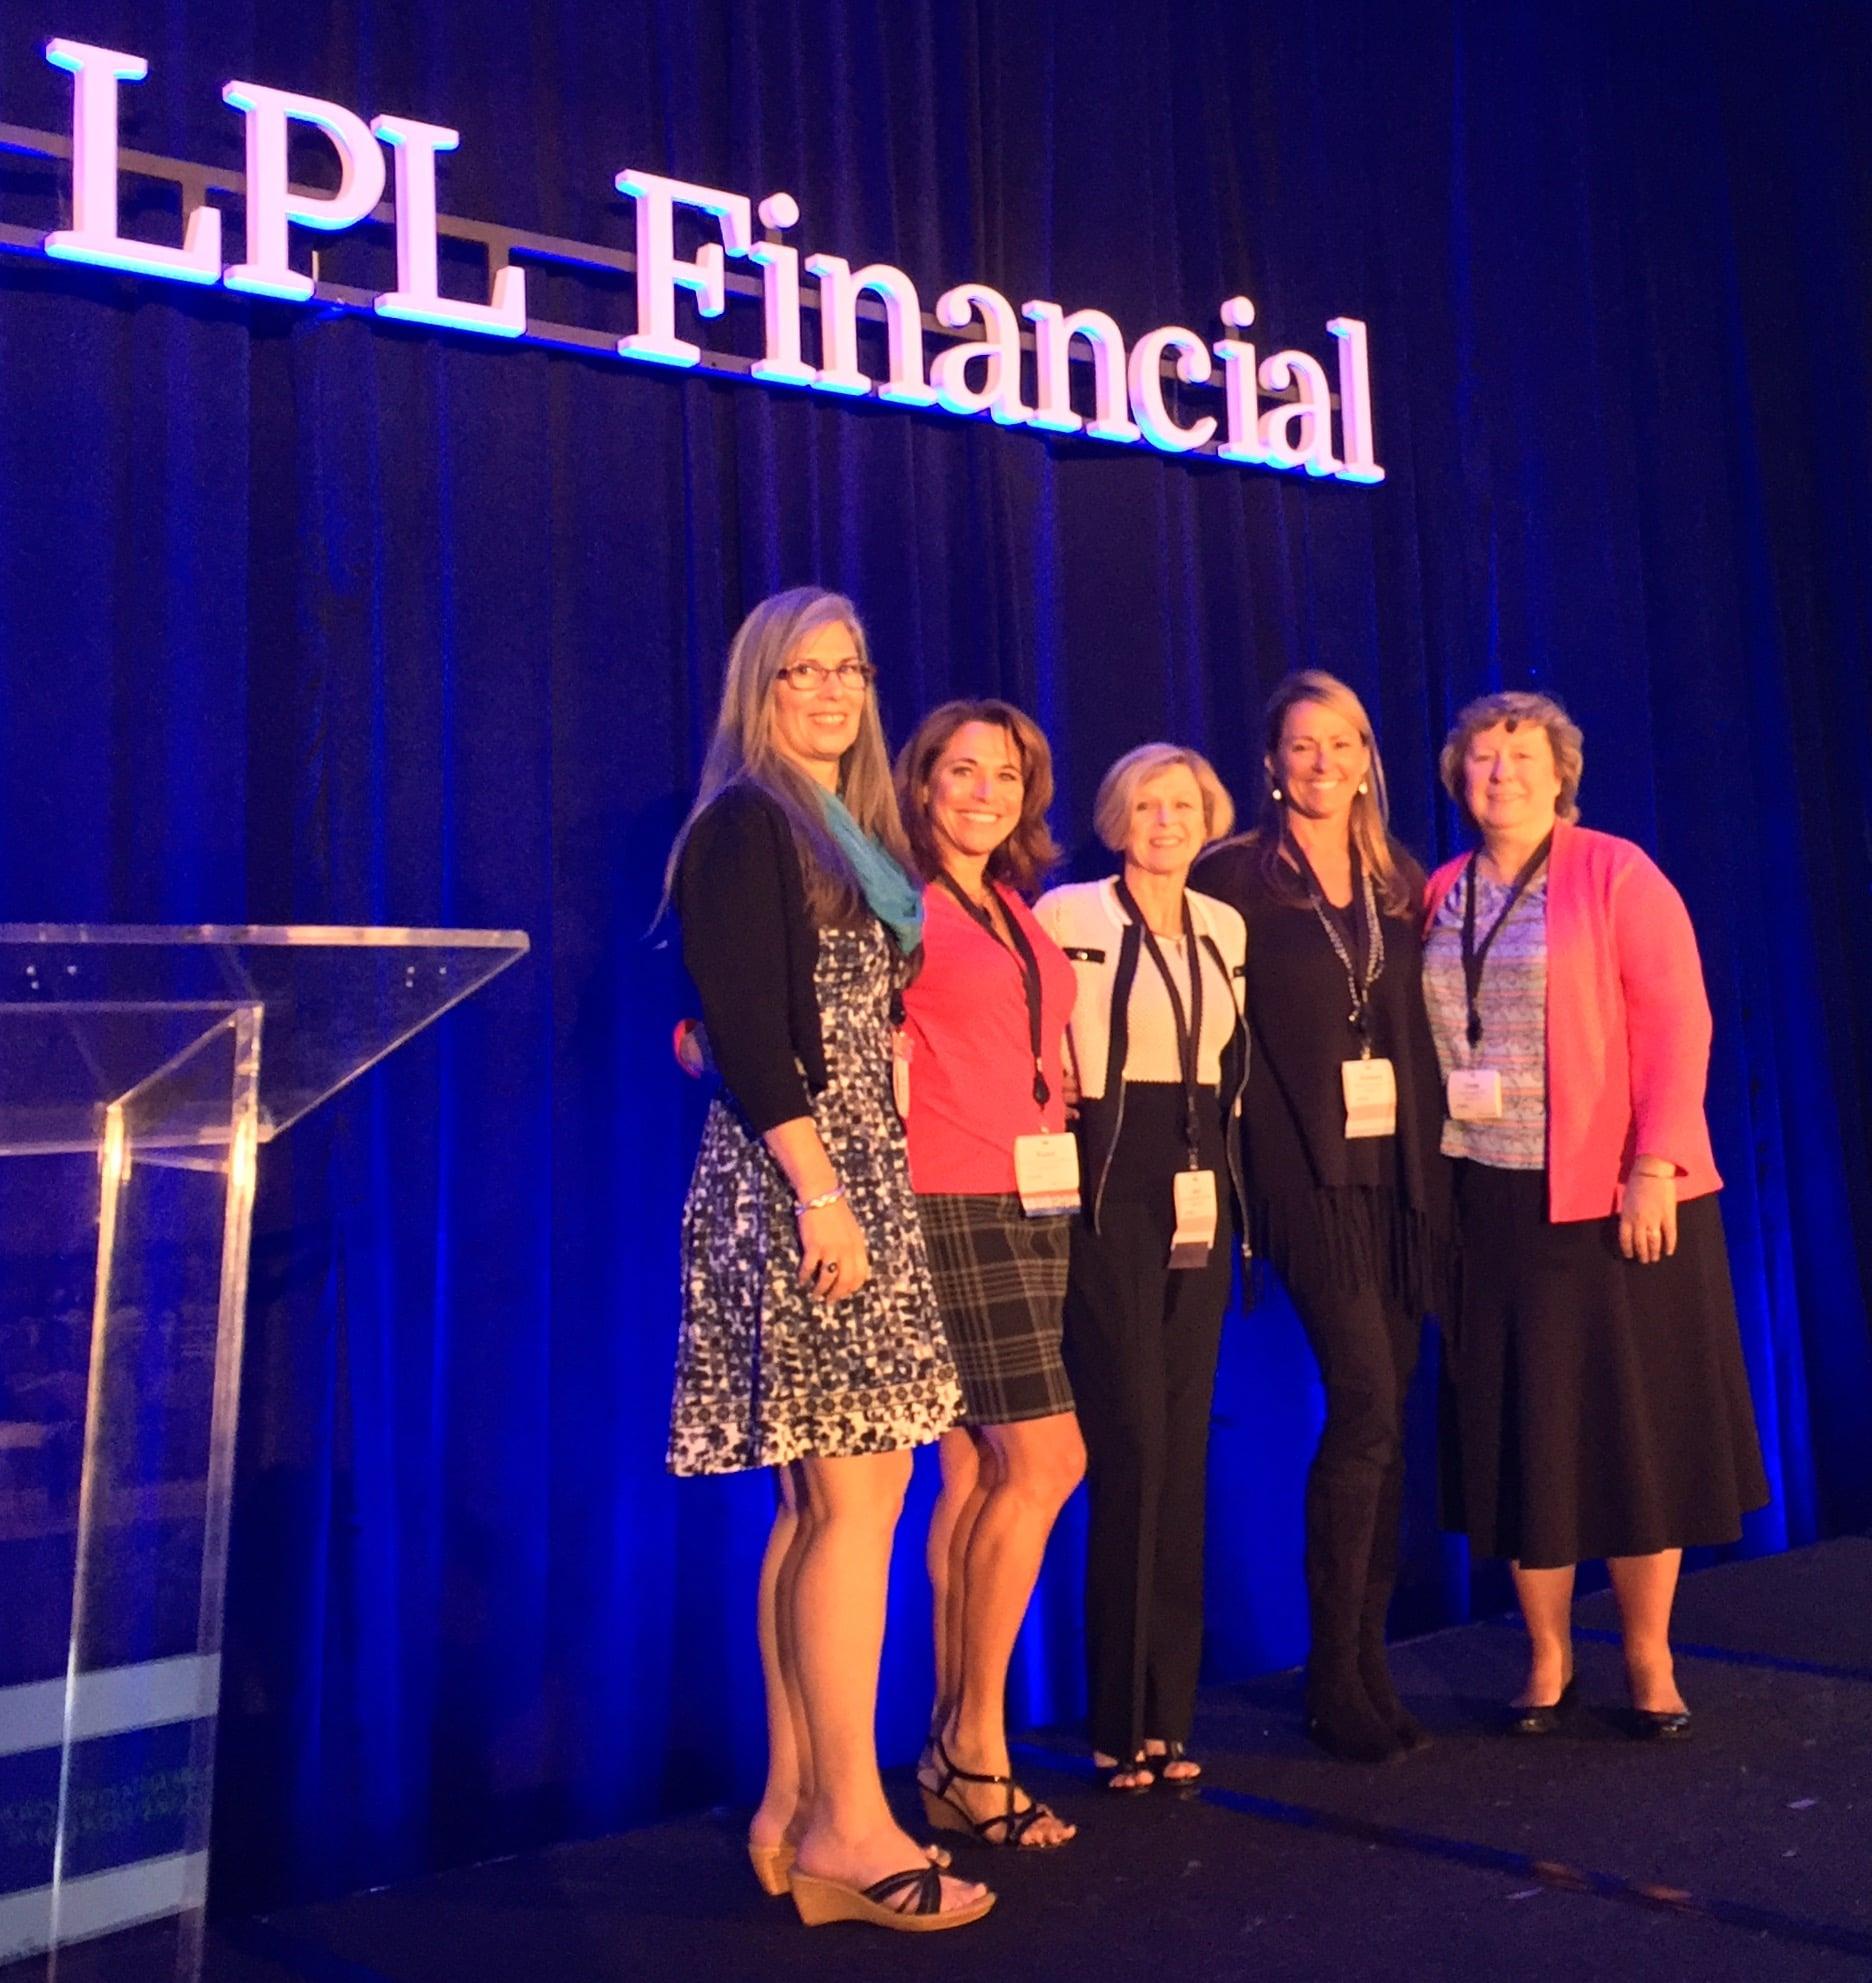 financial strategies group blog giving more kimberly deprospero cfp® attends lpl financial s women advisors leadership forum